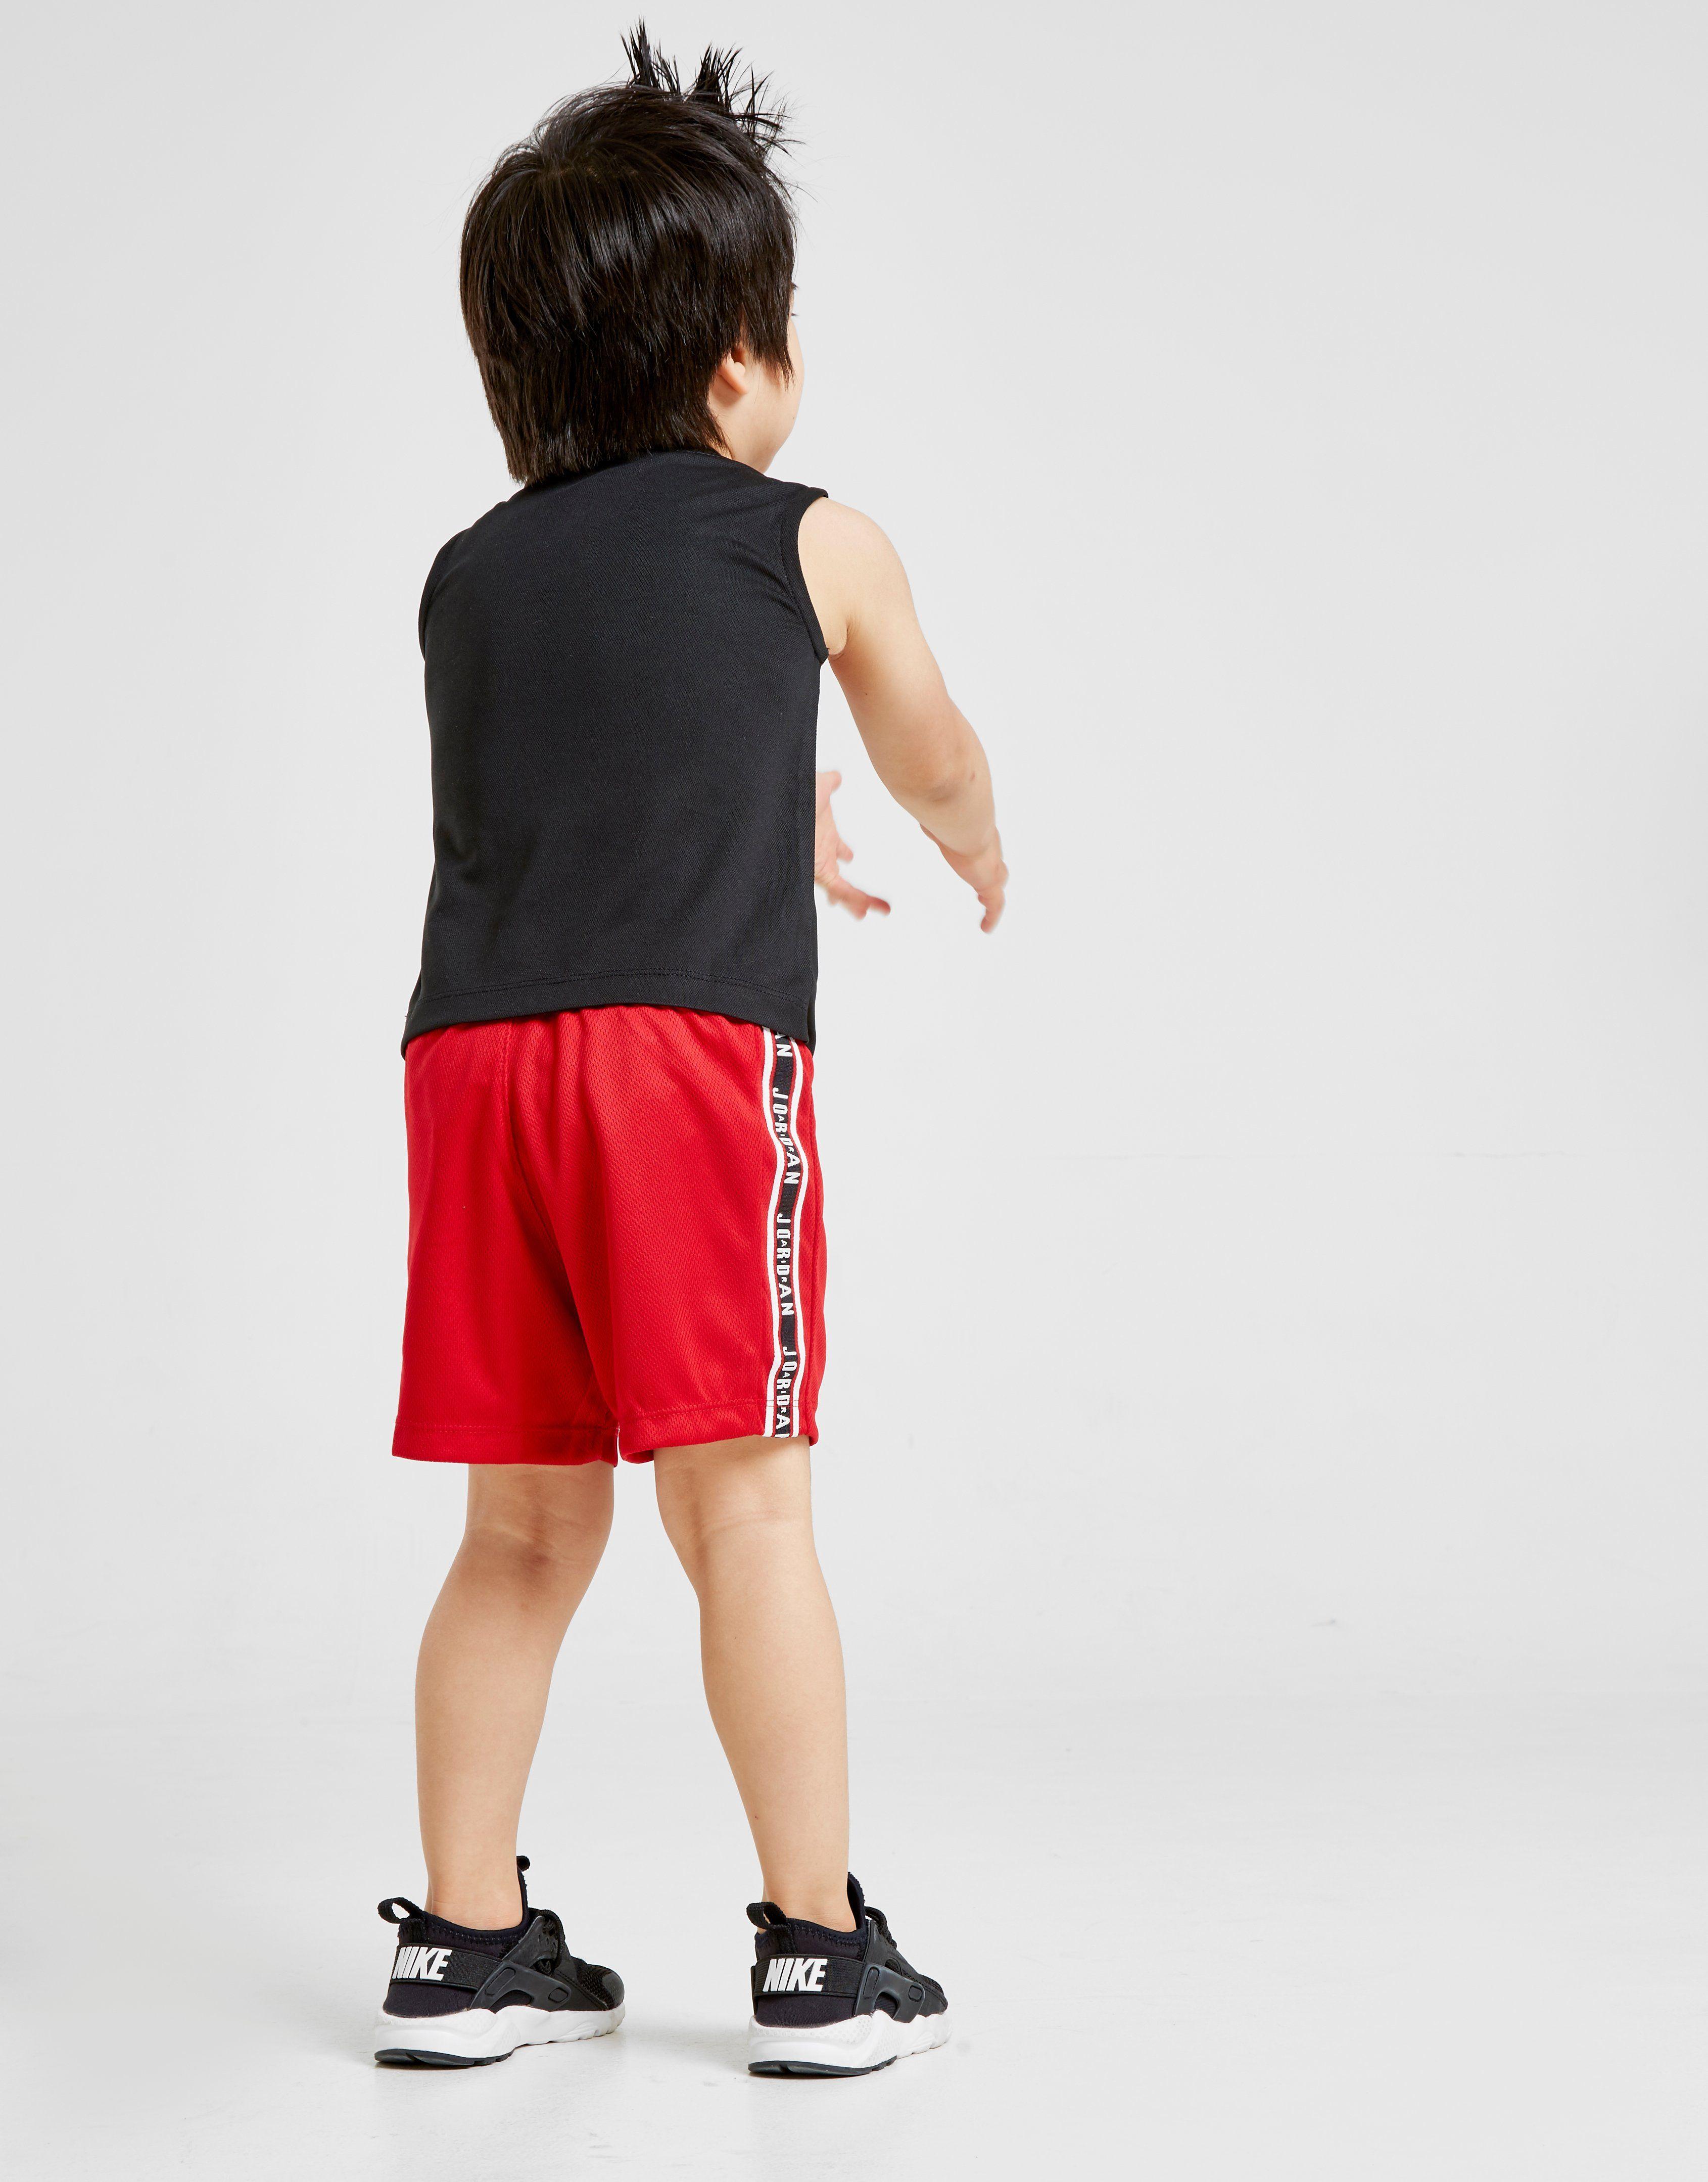 Jordan Tape Muscle Vest/Shorts Set Infant